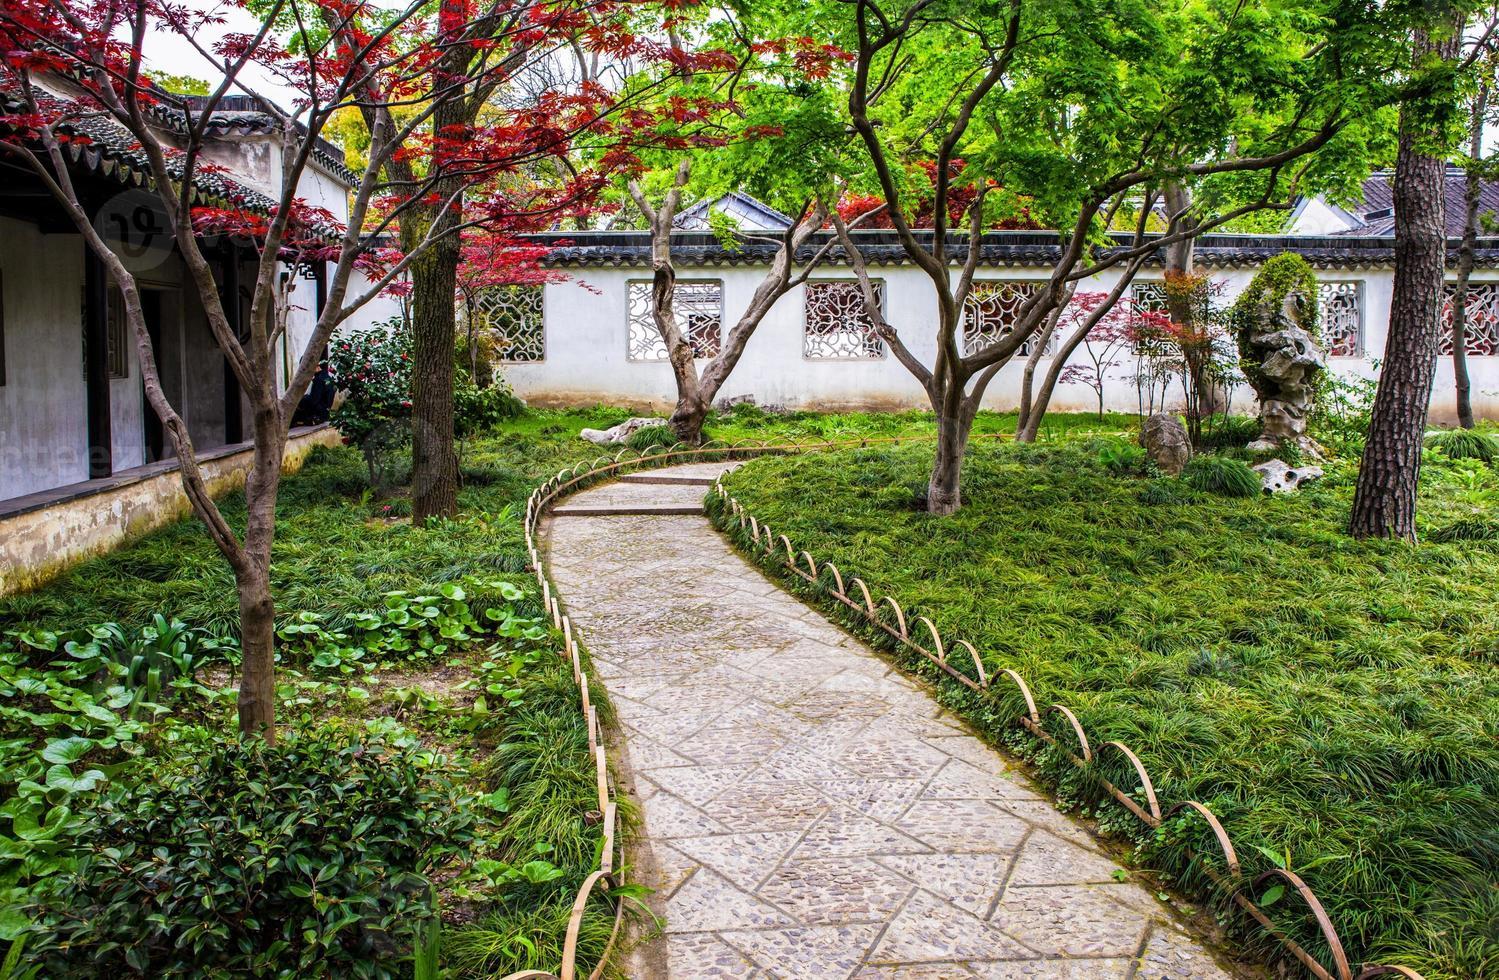 humilde jardín del administrador (zhuozheng) foto